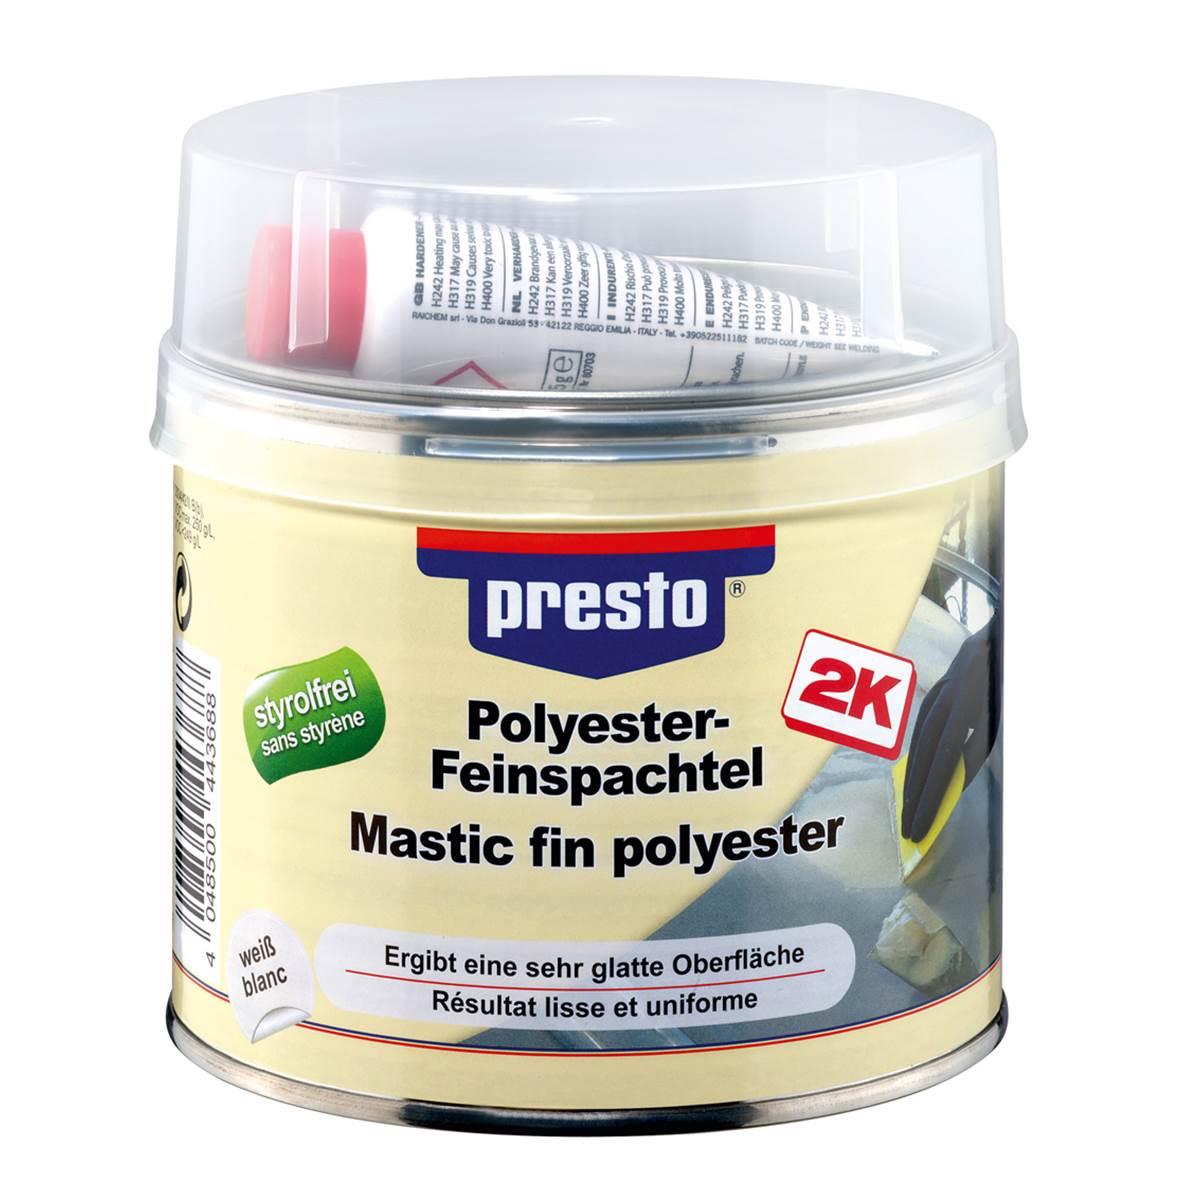 Mastic fin polyester et durcisseur Presto 1kg